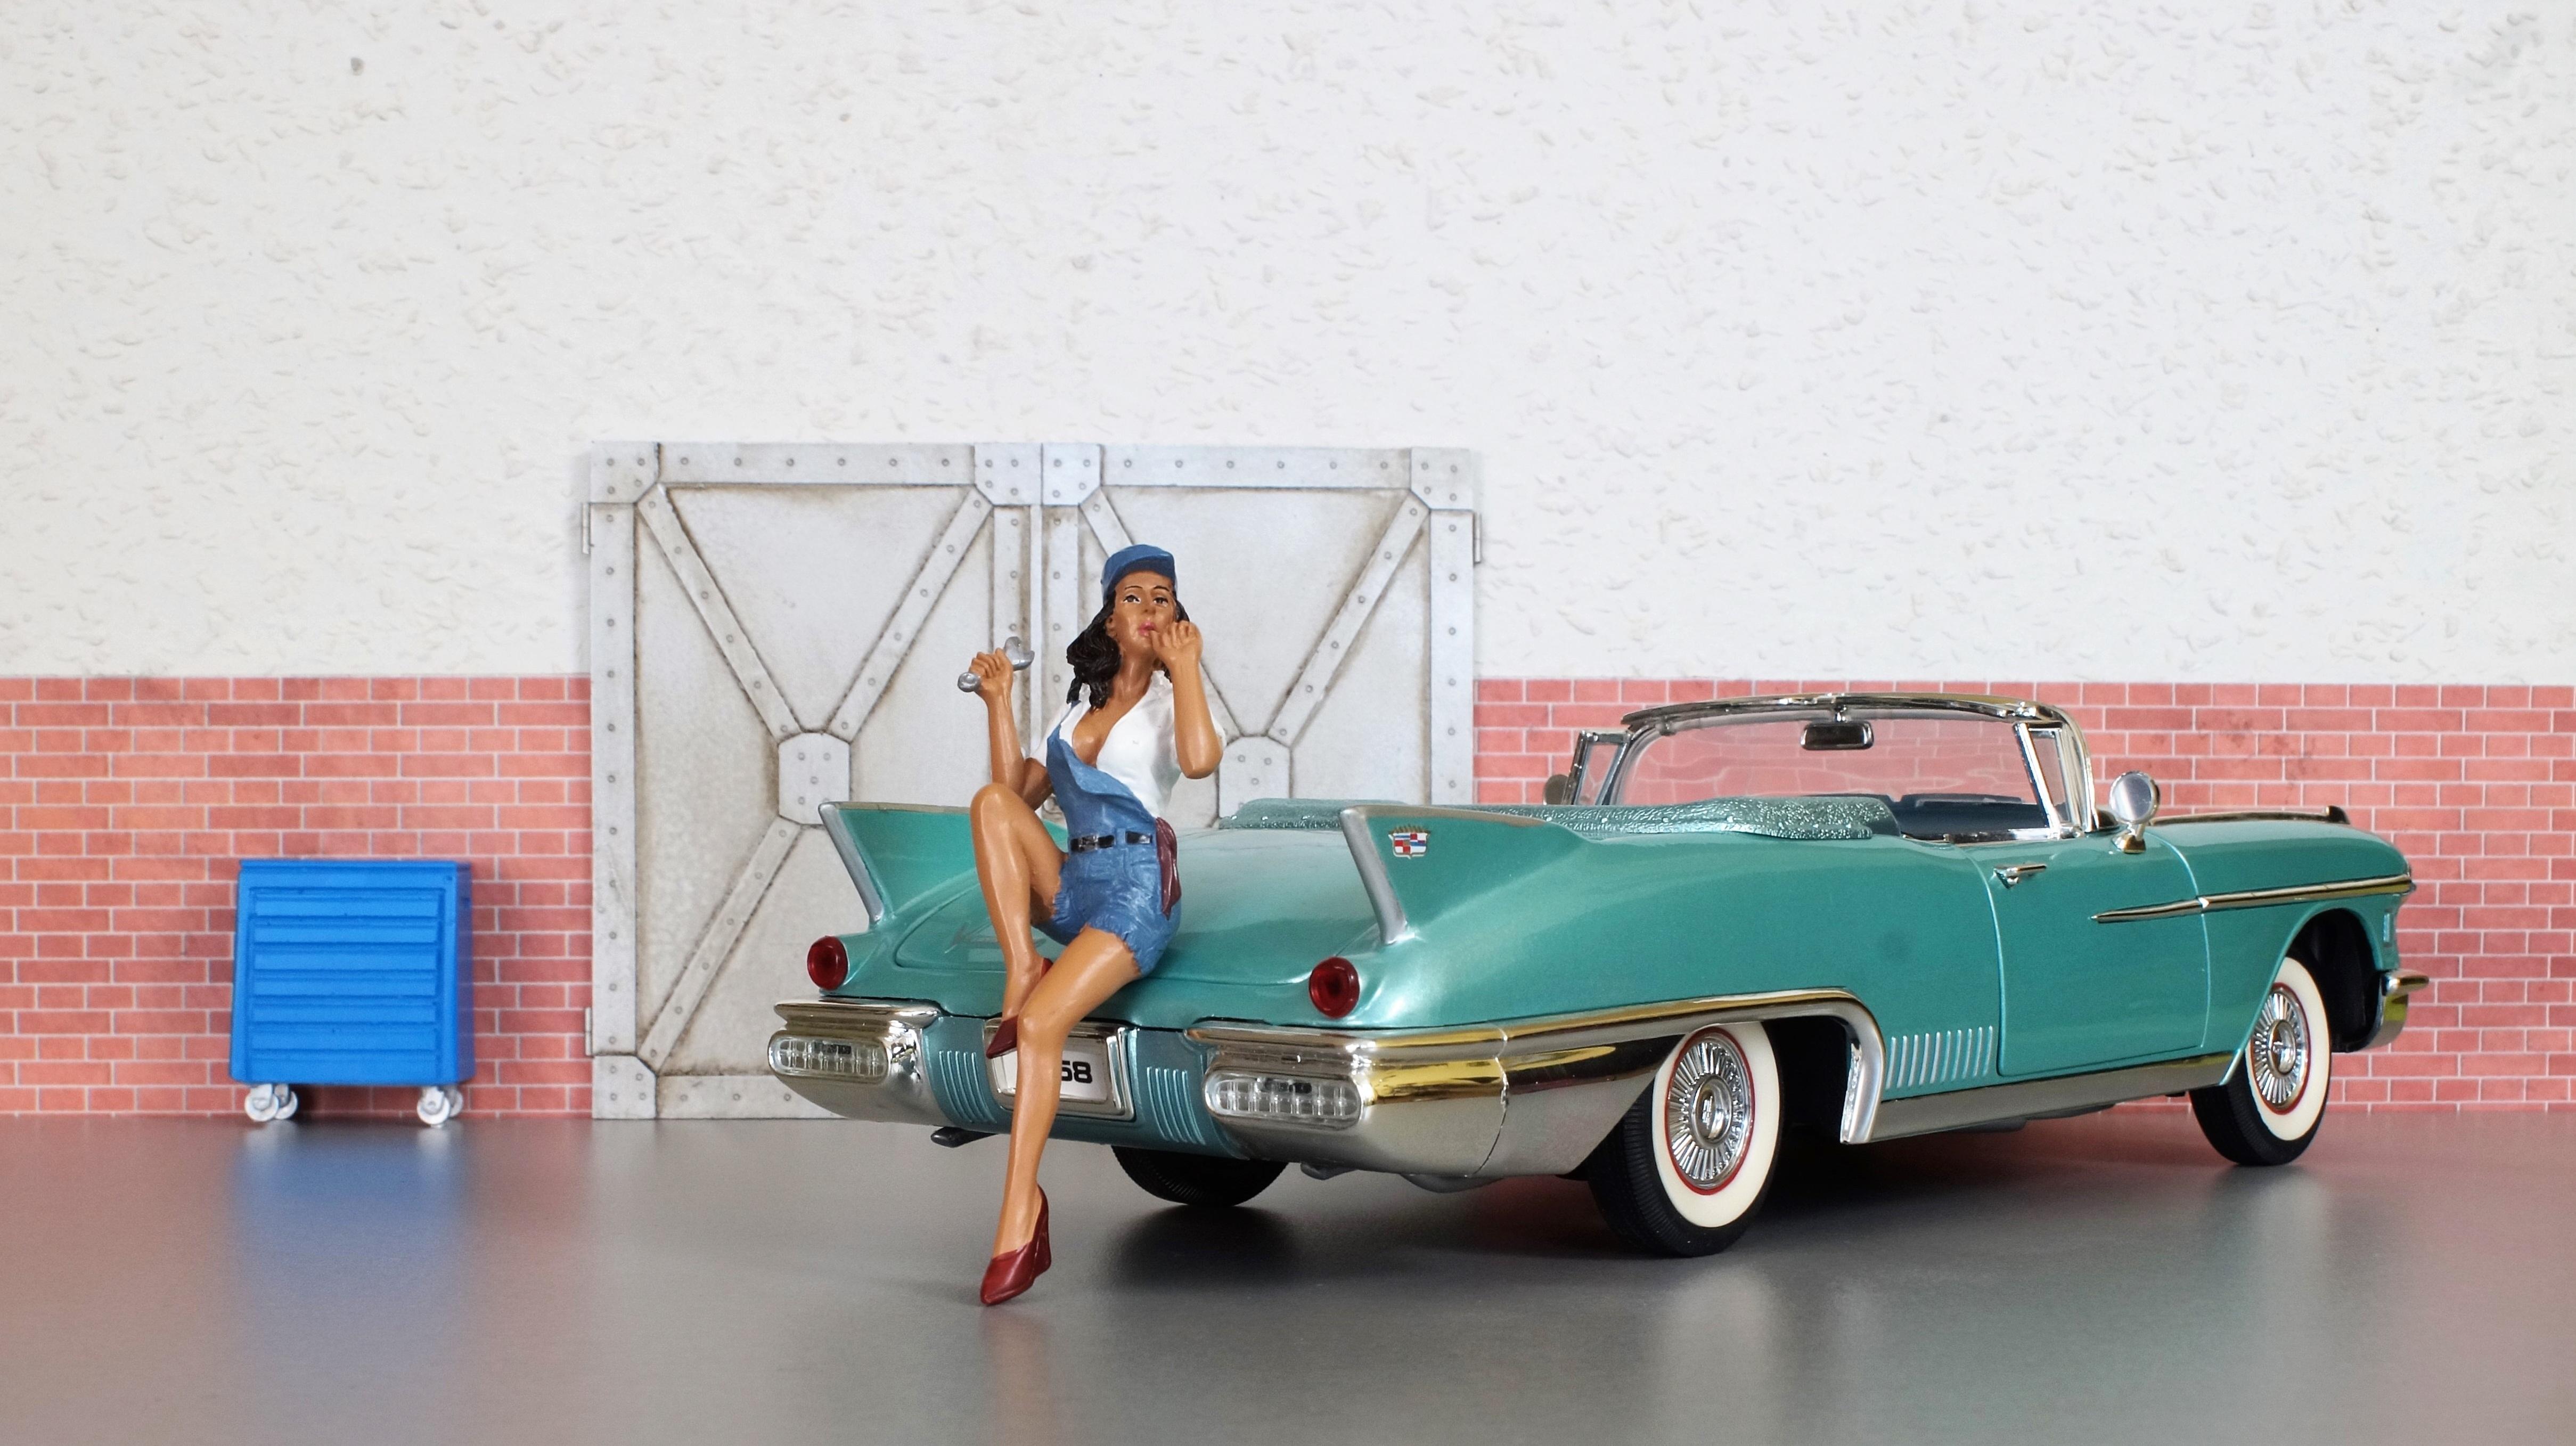 Free Images : old, workshop, usa, america, auto, vintage car ...